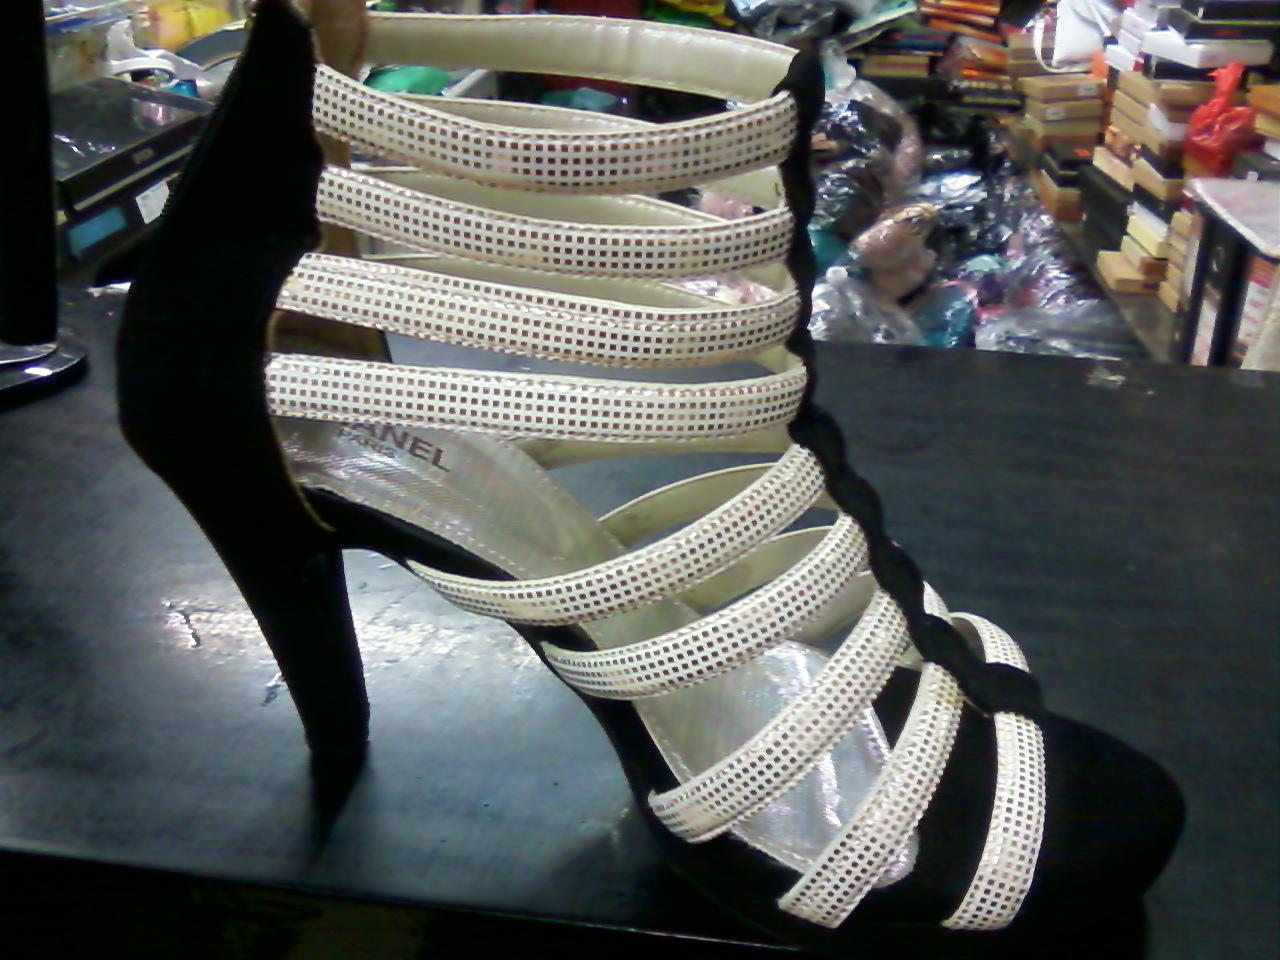 hasil sepatu buatan kami (beda tinggi hak dan bahan tali krn sesuai